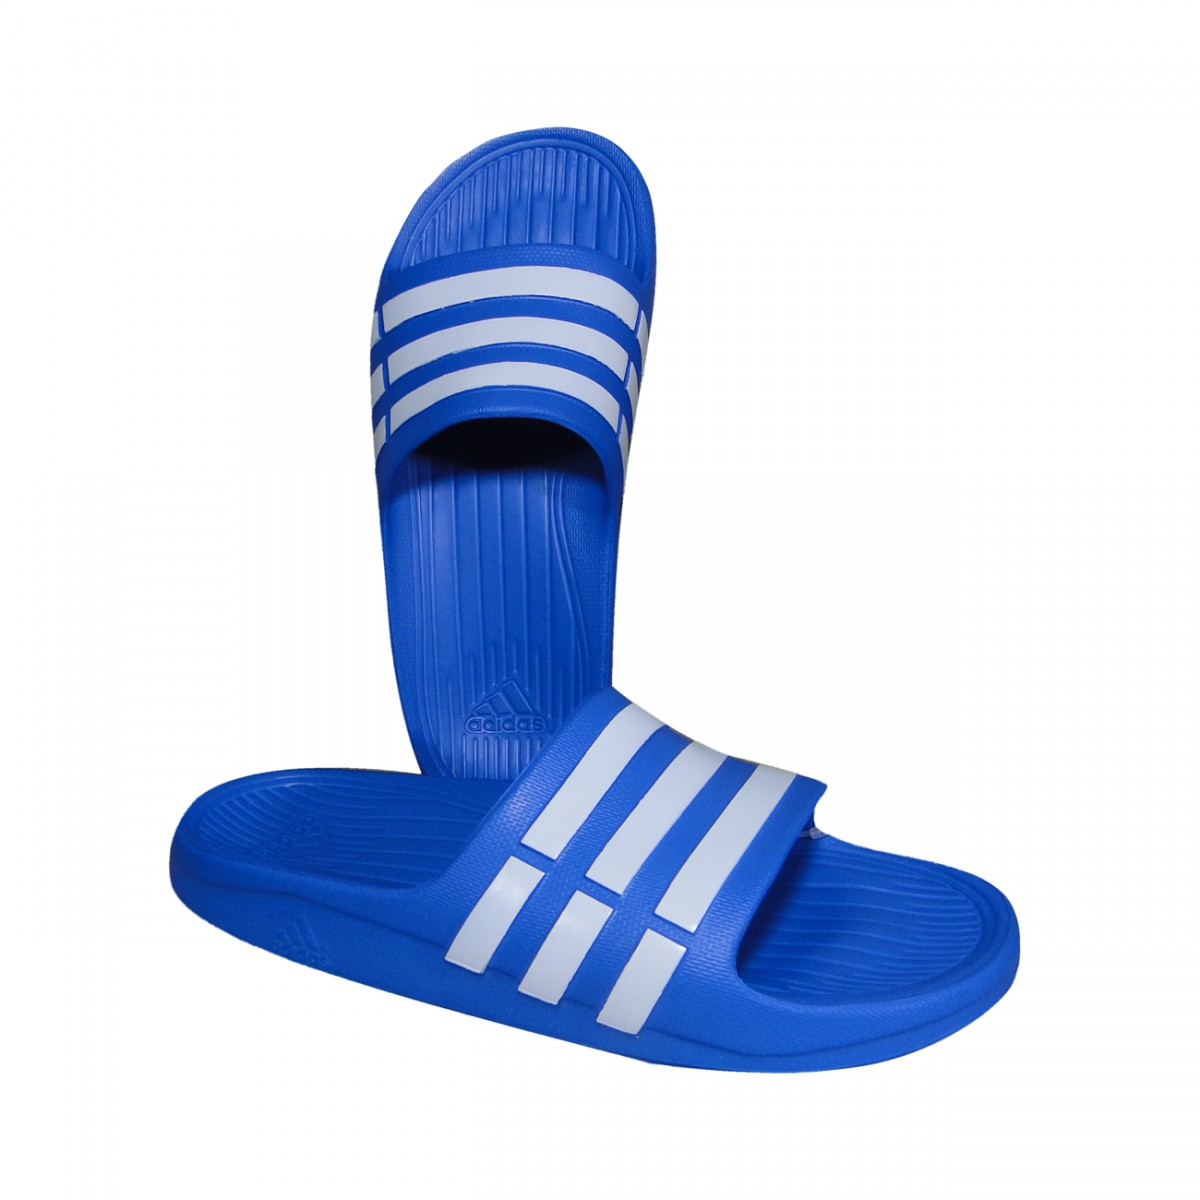 ac9c27aef146d1 Chinelo Adidas Duramo Slide Juvenil